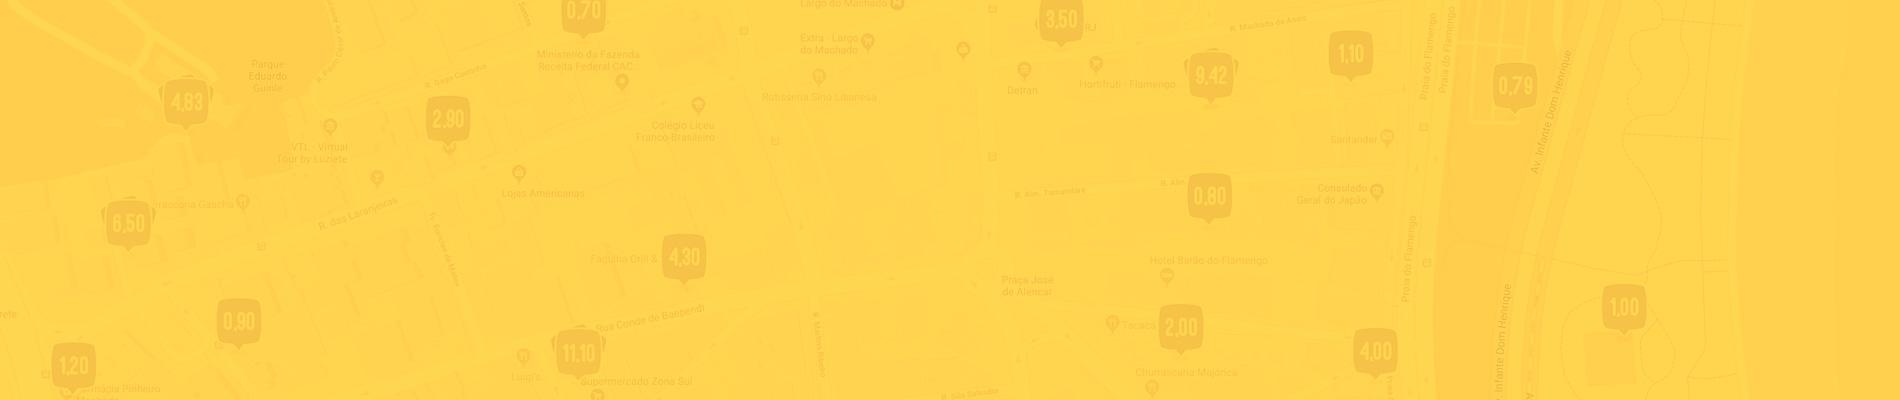 PiggyPeg - Background